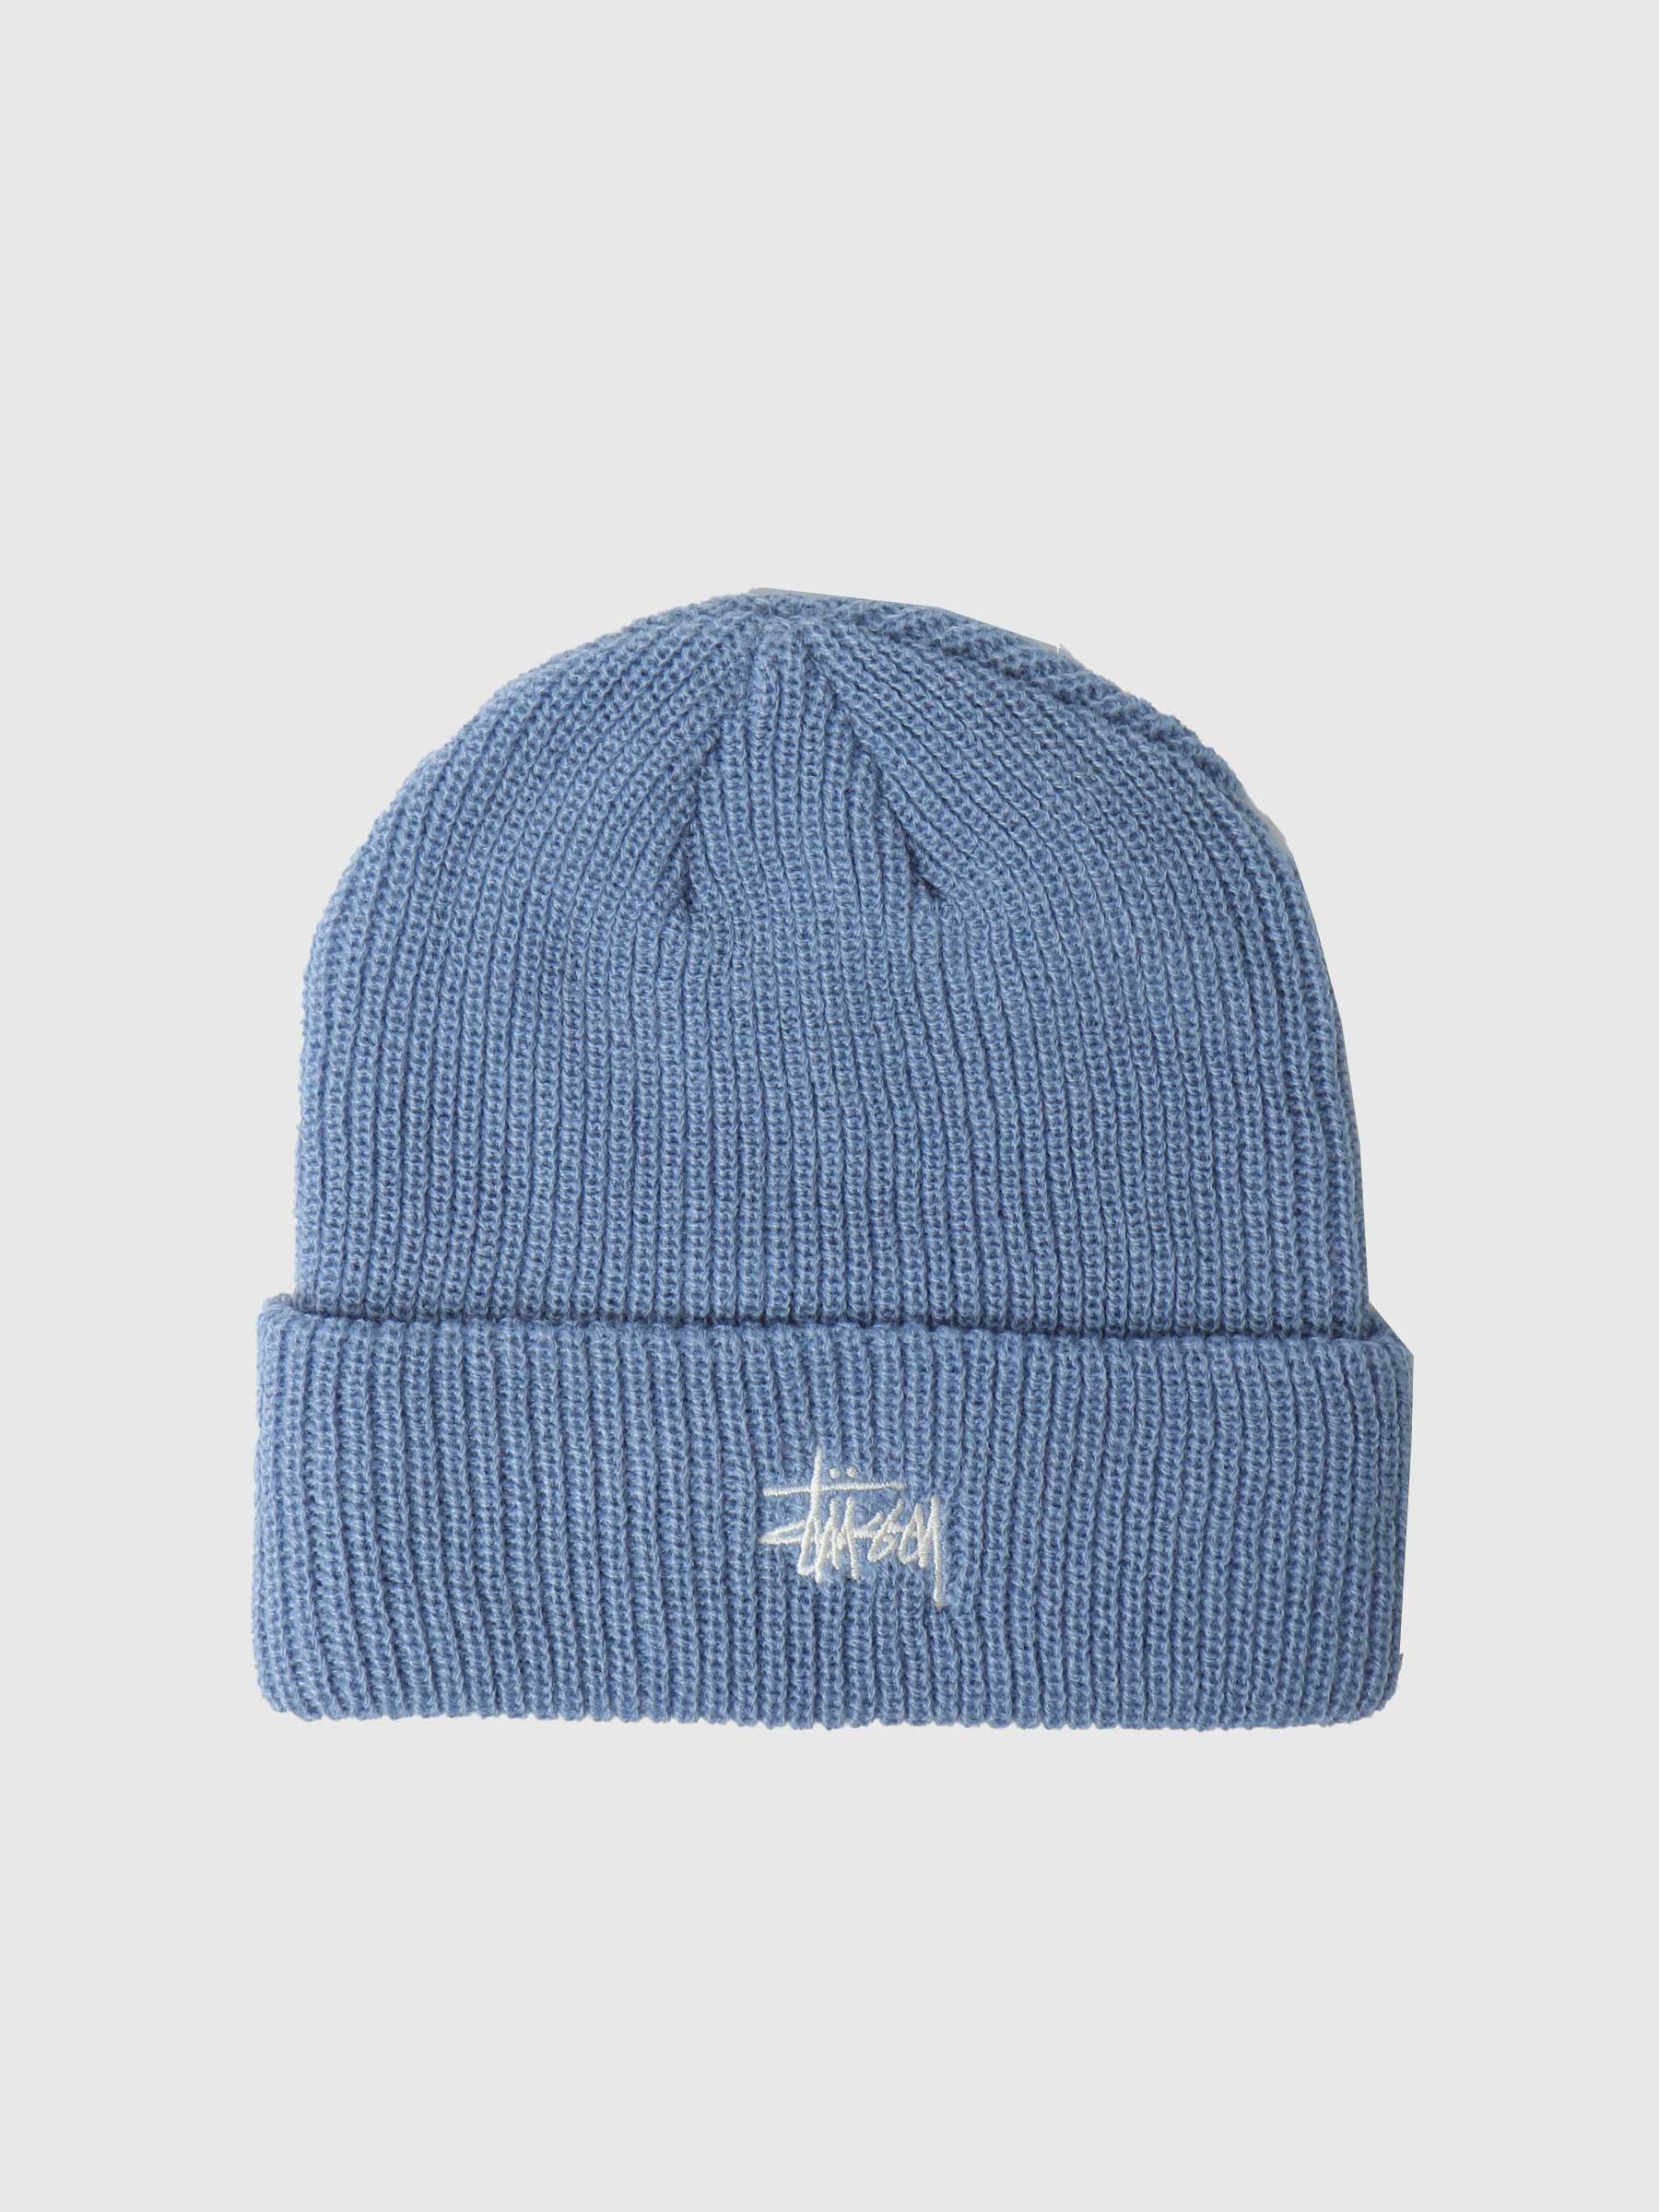 Basic Cuff Beanie Powder Blue 1321019